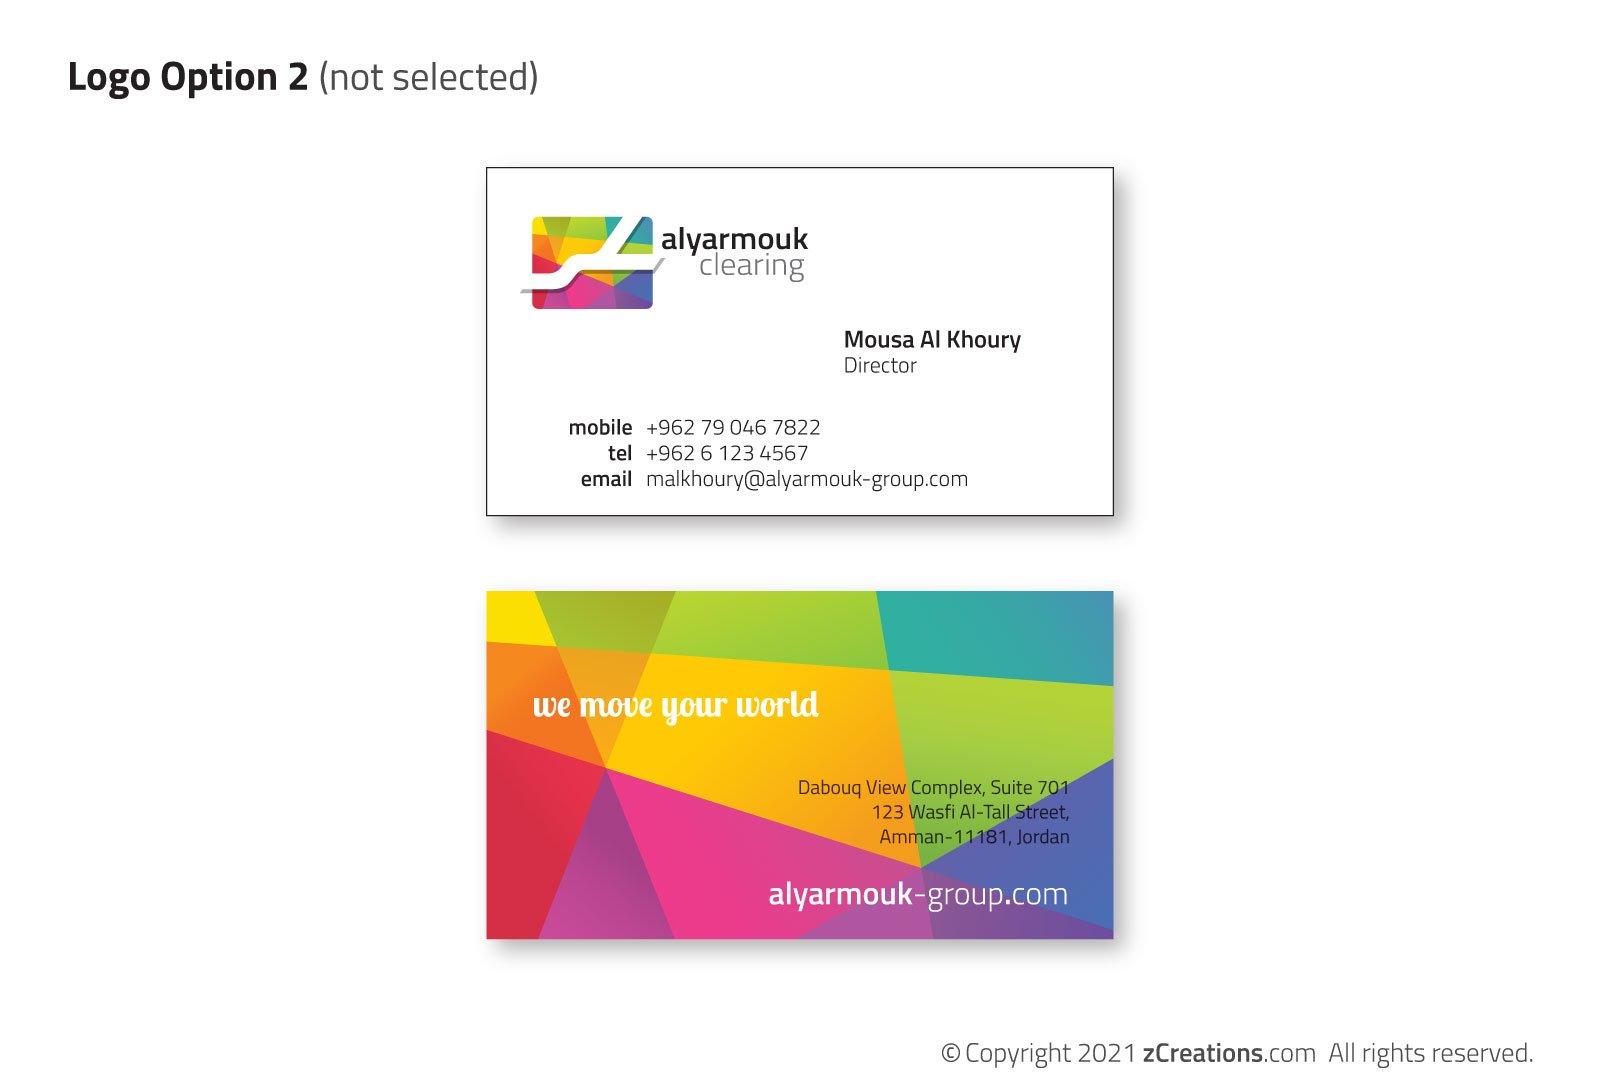 Alyarmouk Group Alternate Logo Cards Design